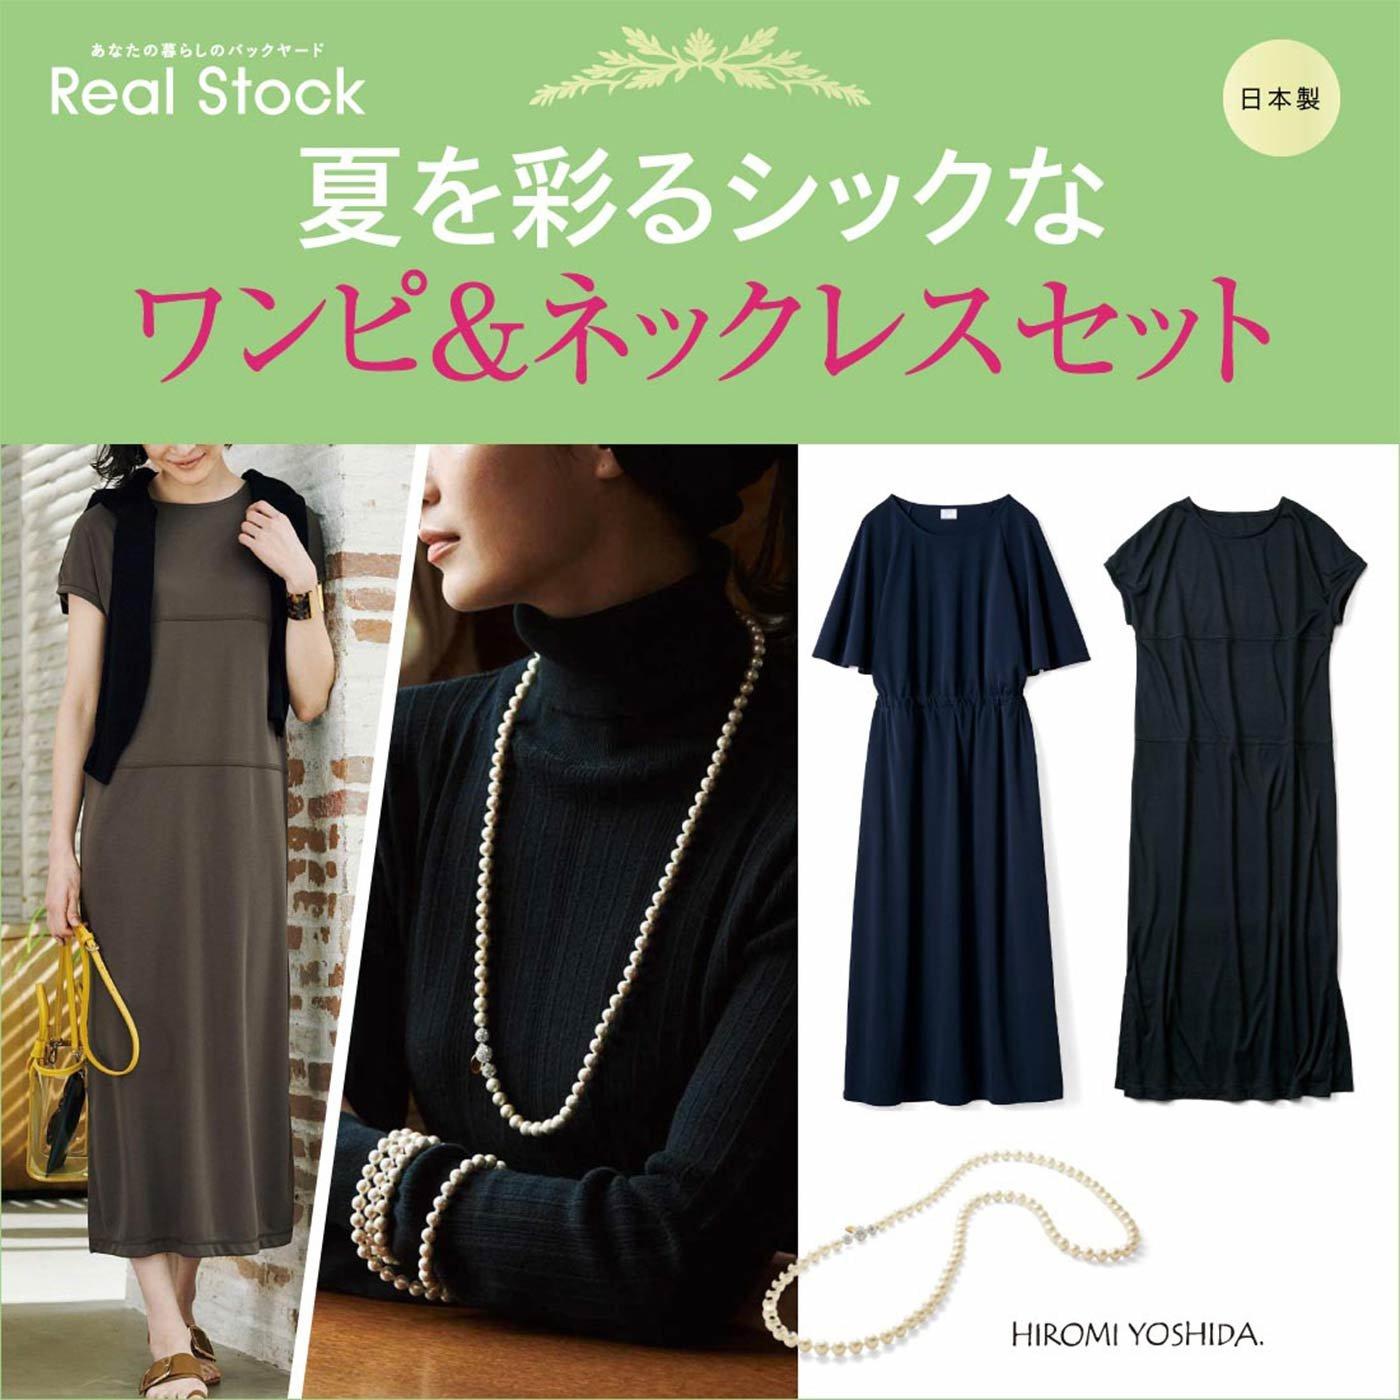 HIROMI YOSHIDA. 夏を彩るシックなワンピ&ネックレスセット